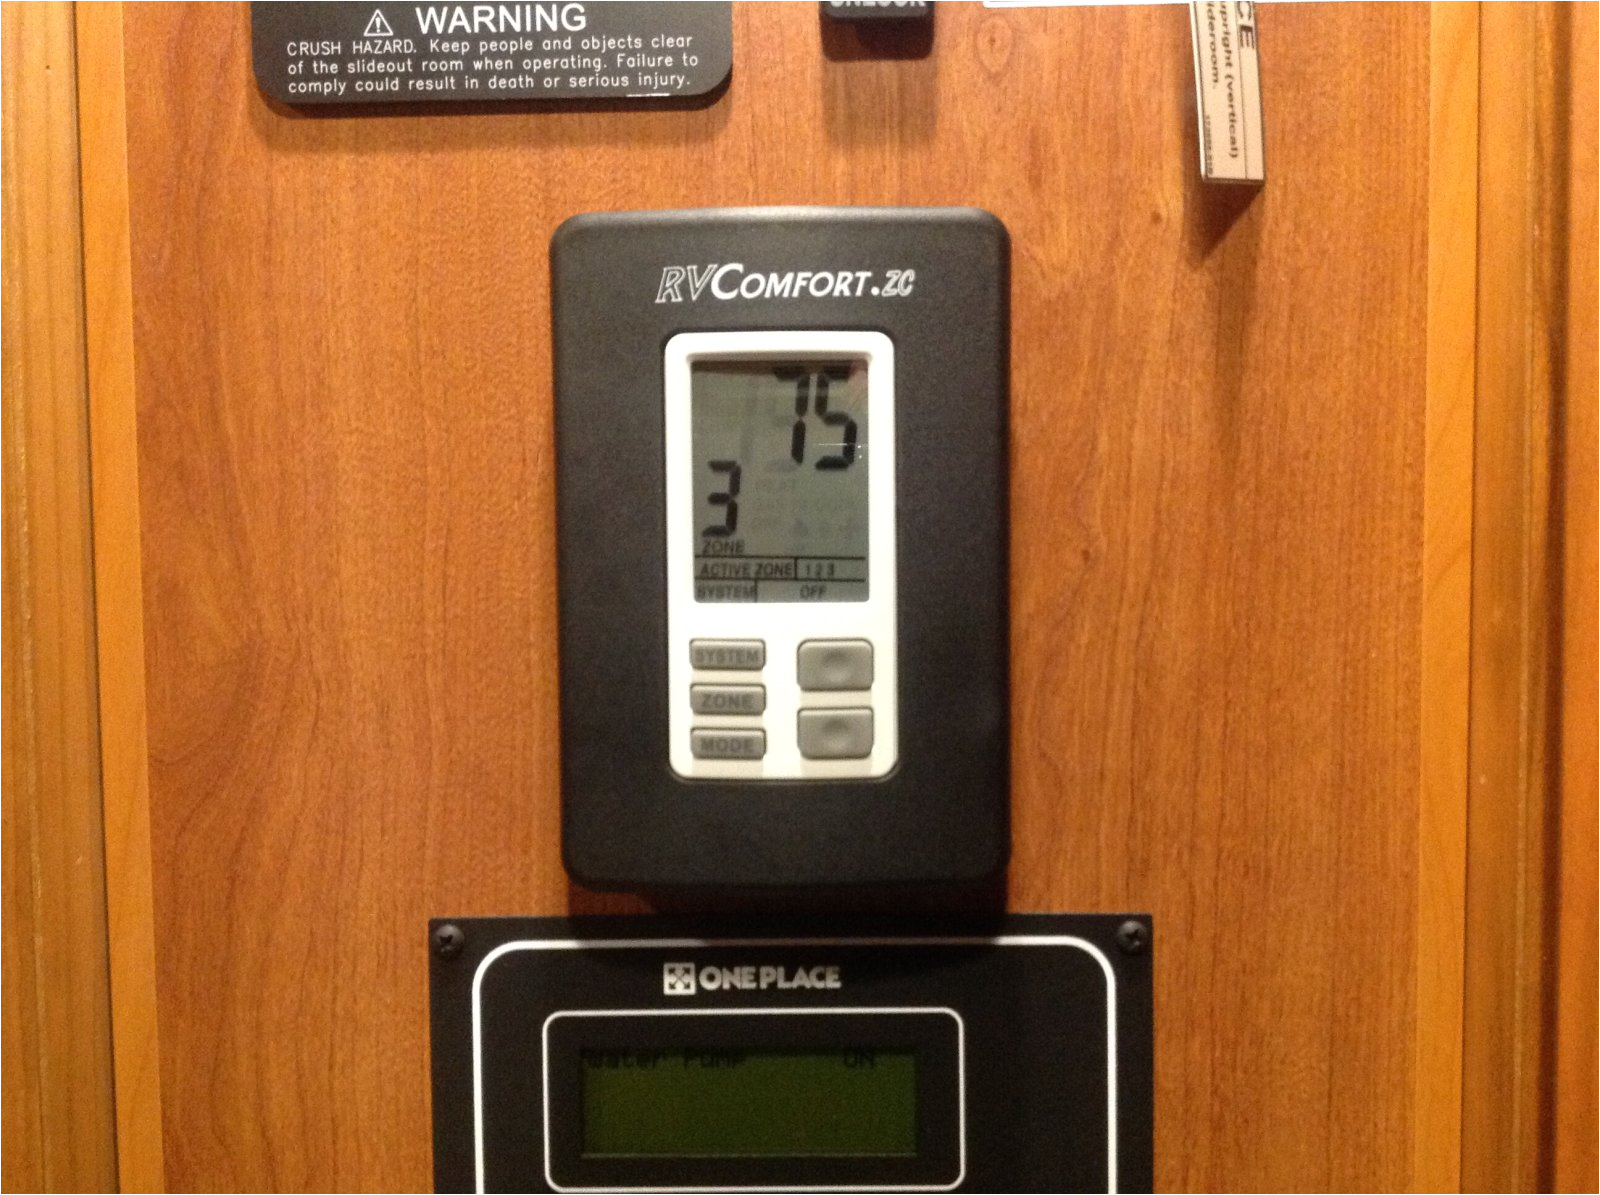 Rv Comfort Zc thermostat Wiring Diagram Wrg 5324 Rv Comfort Zc thermostat Wiring Diagram